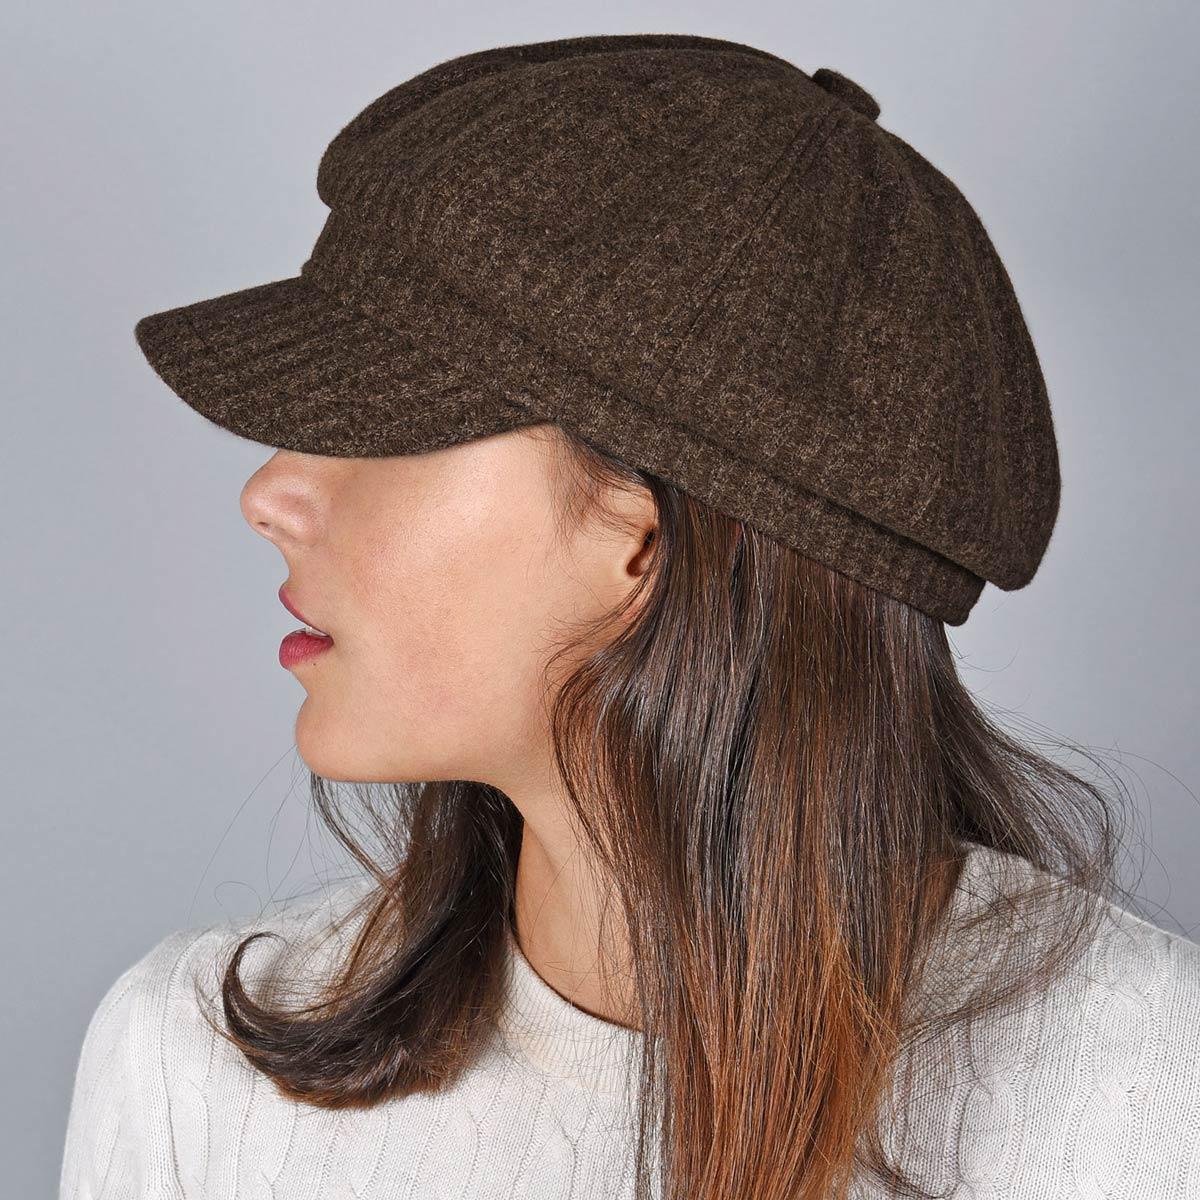 CP-01585-W12-1-casquette-hiver-femme-marron